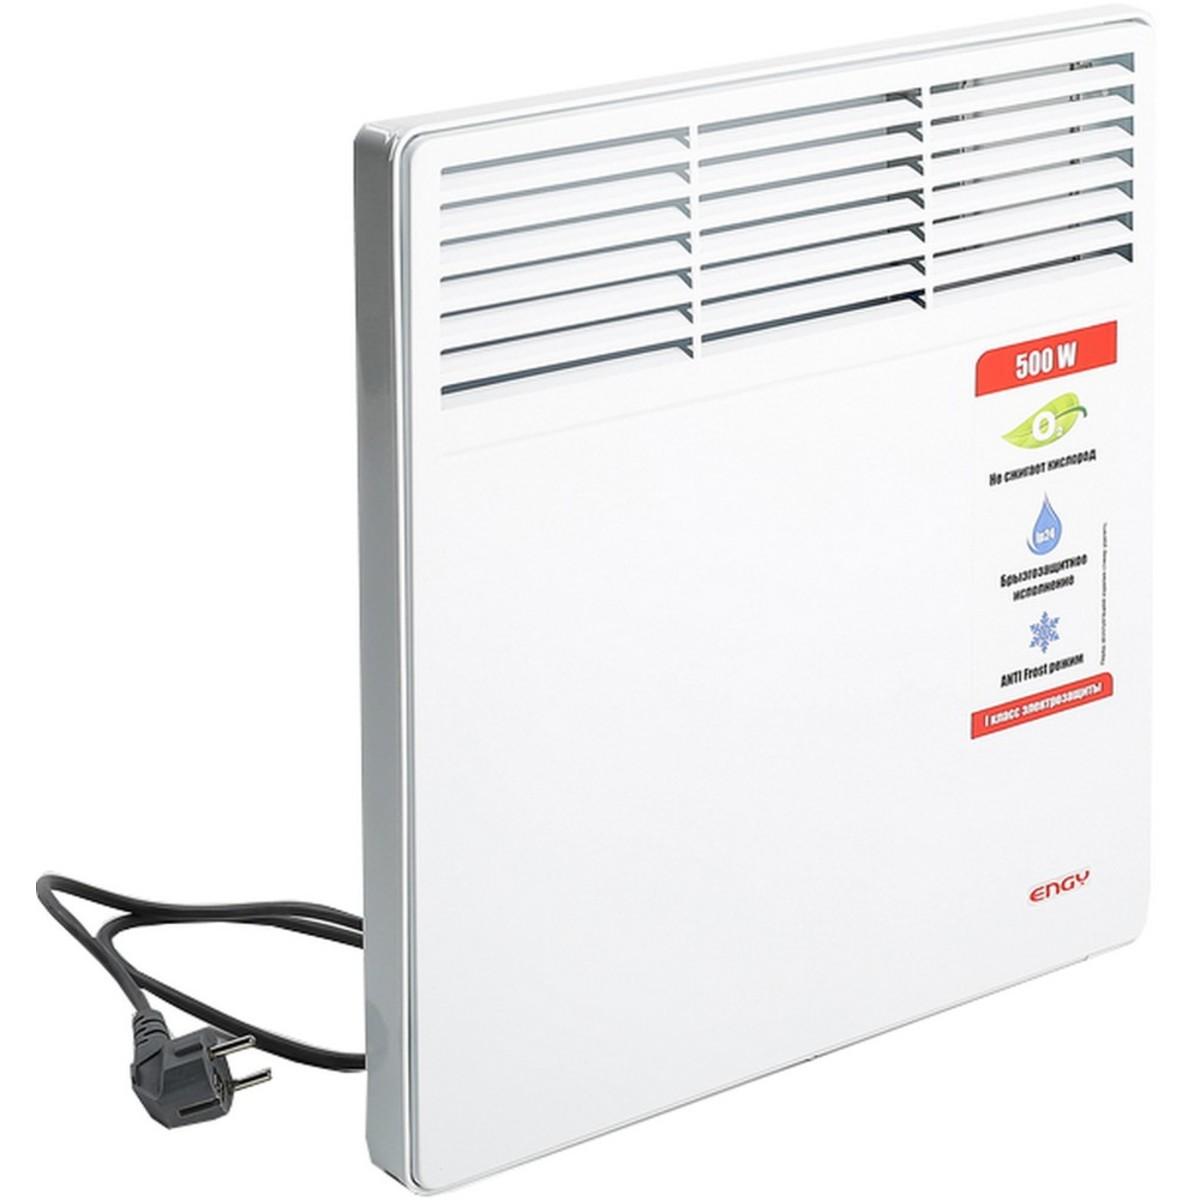 Электрический конвектор ENGY Primero-500MWI ЭВНА-05/230 C1